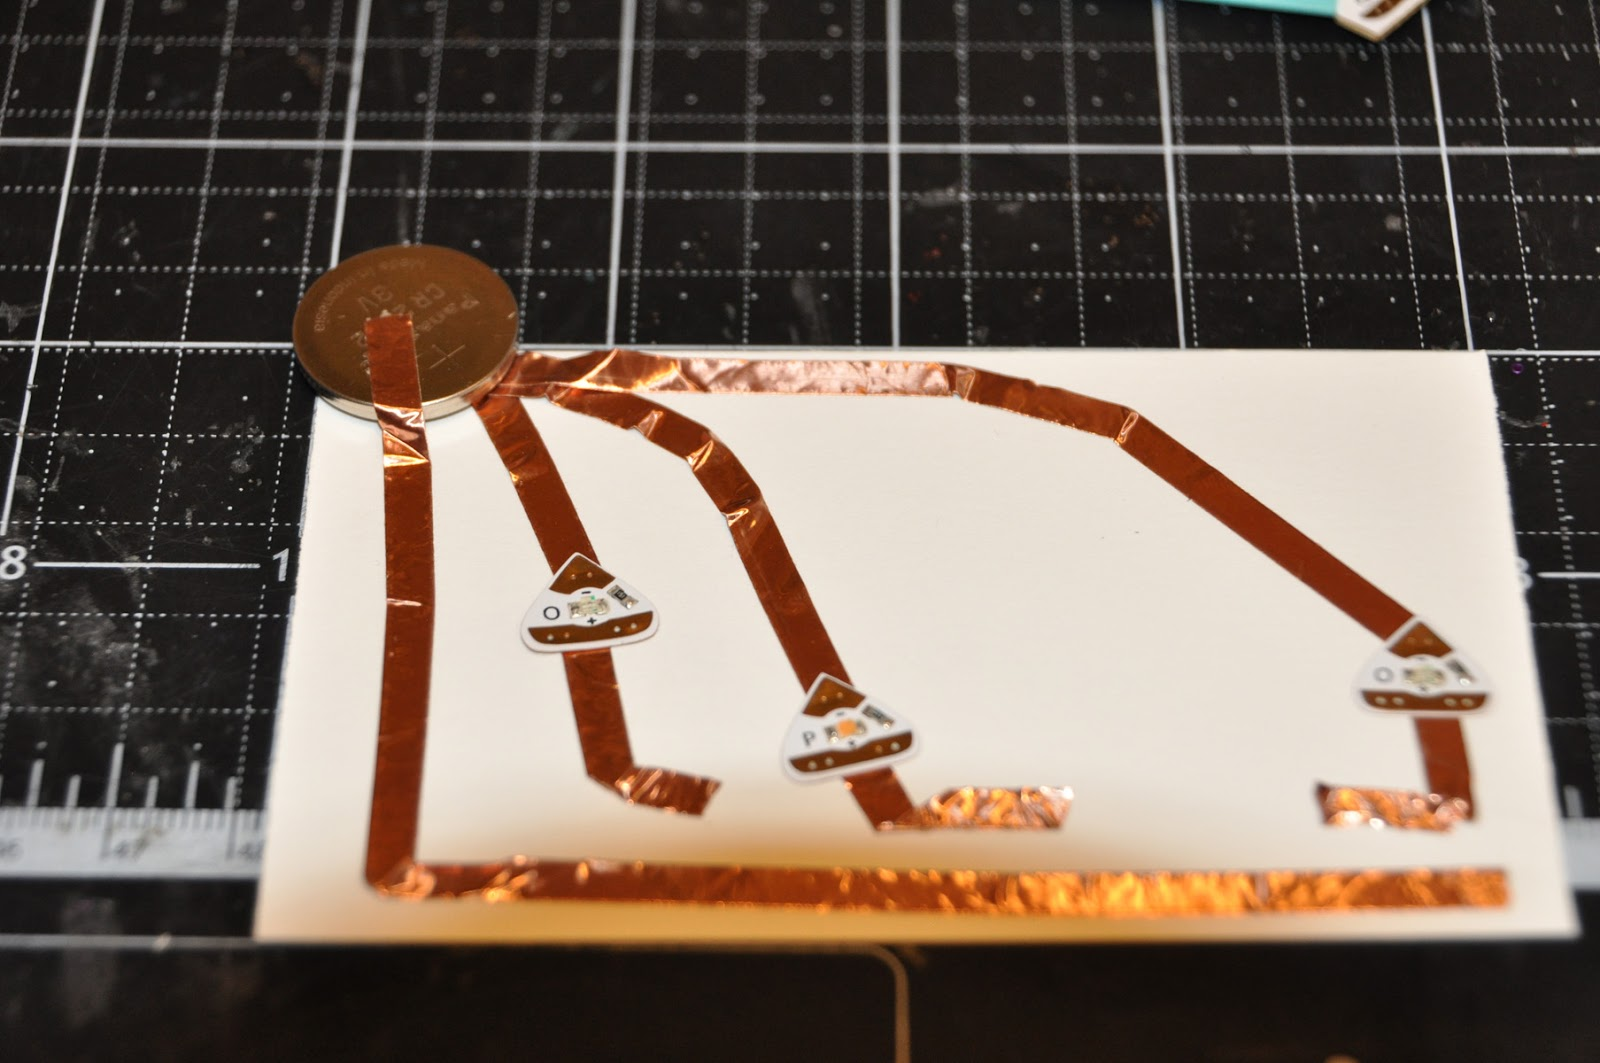 Nancy Keslin Designs Chibitronics Meets My Favorite Things